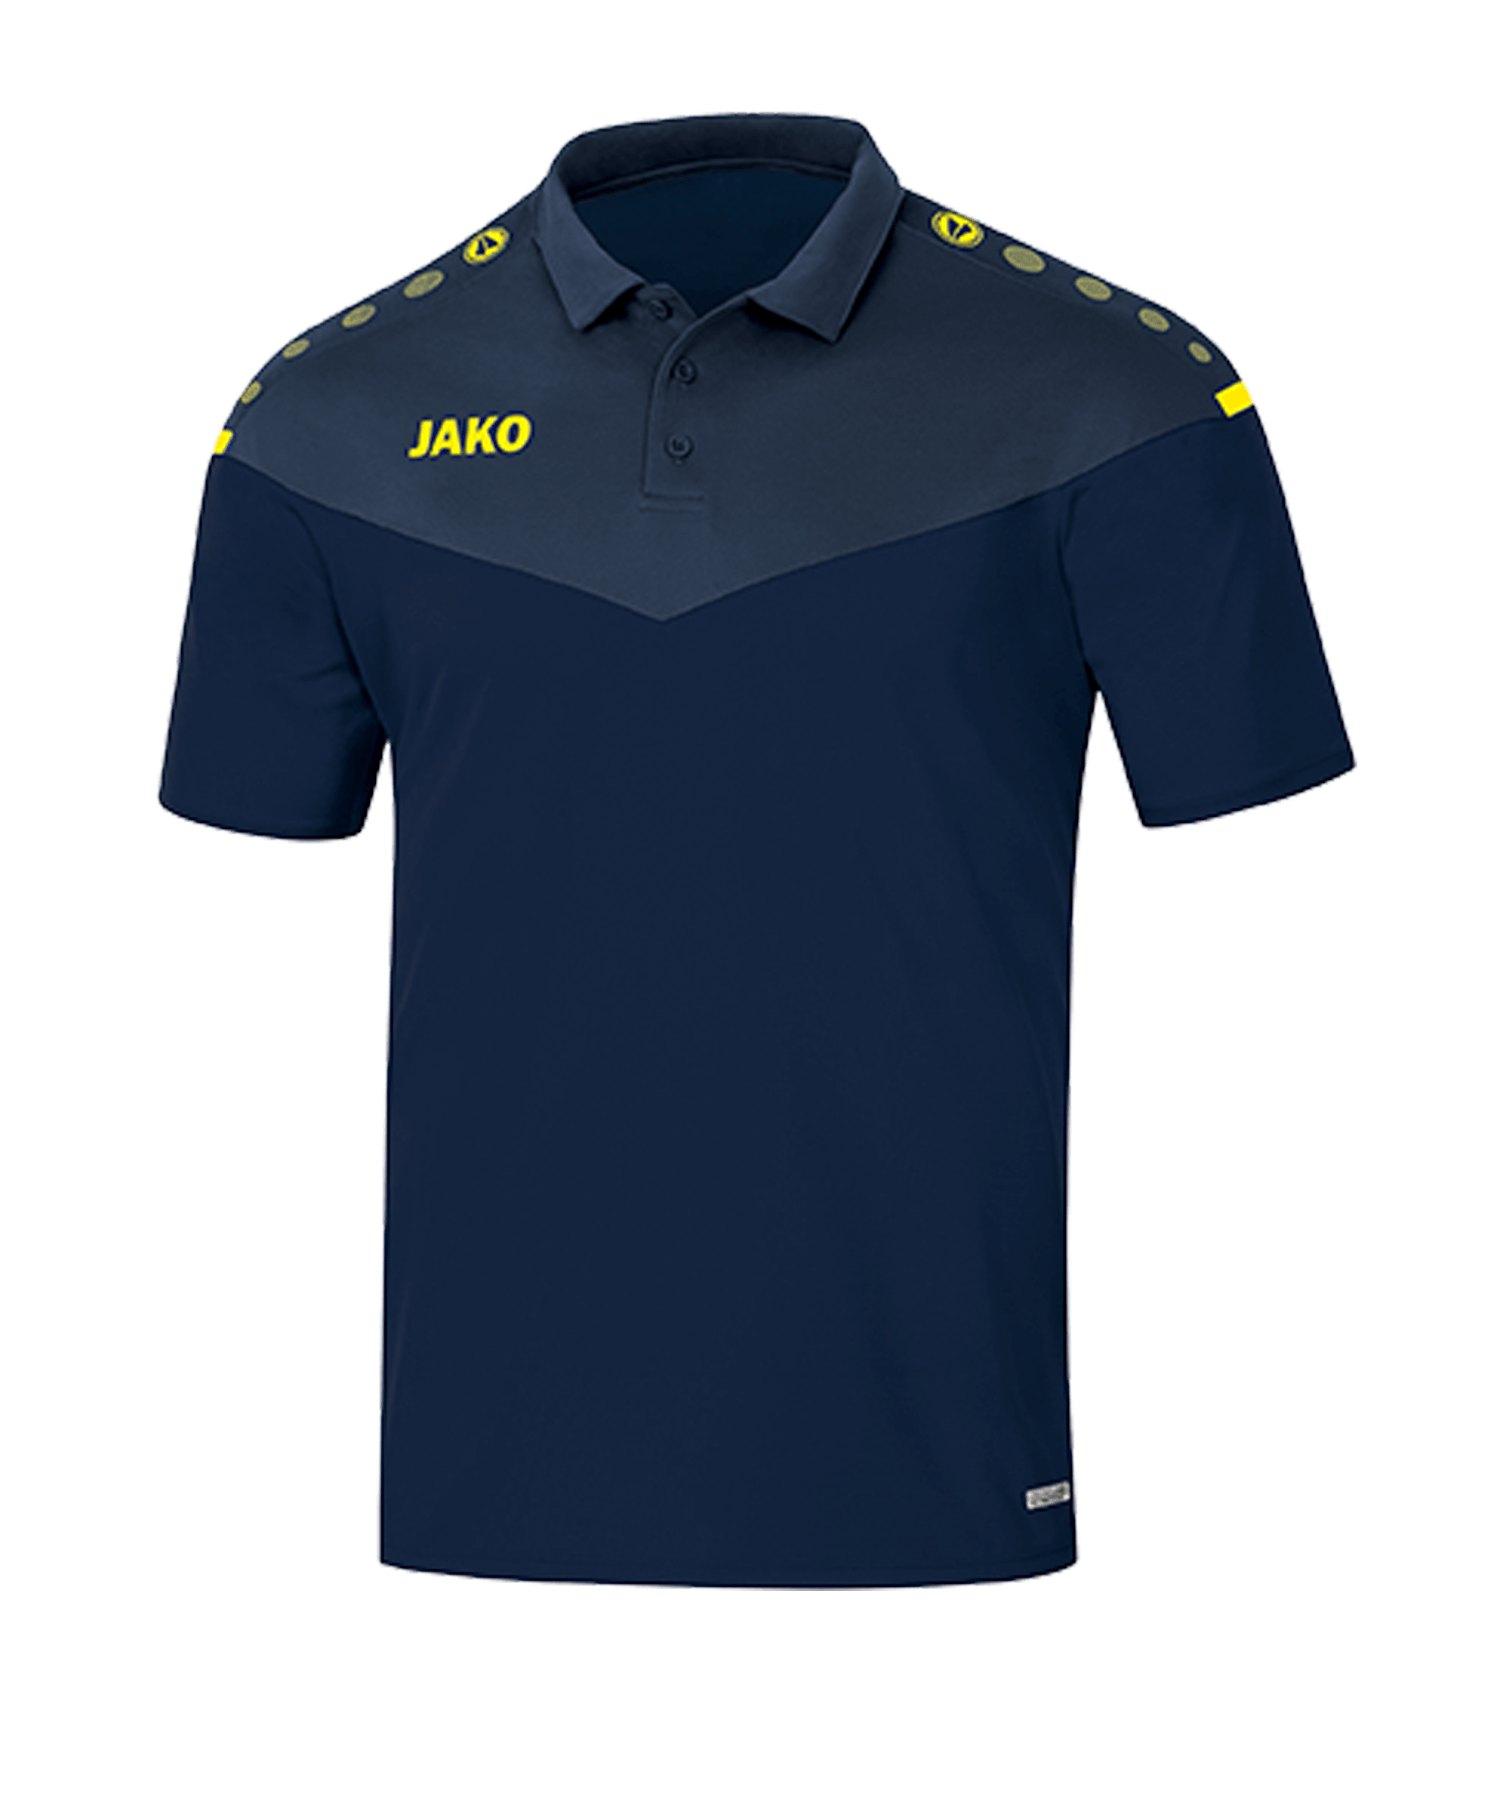 Jako Champ 2.0 Poloshirt Damen Blau F93 - blau